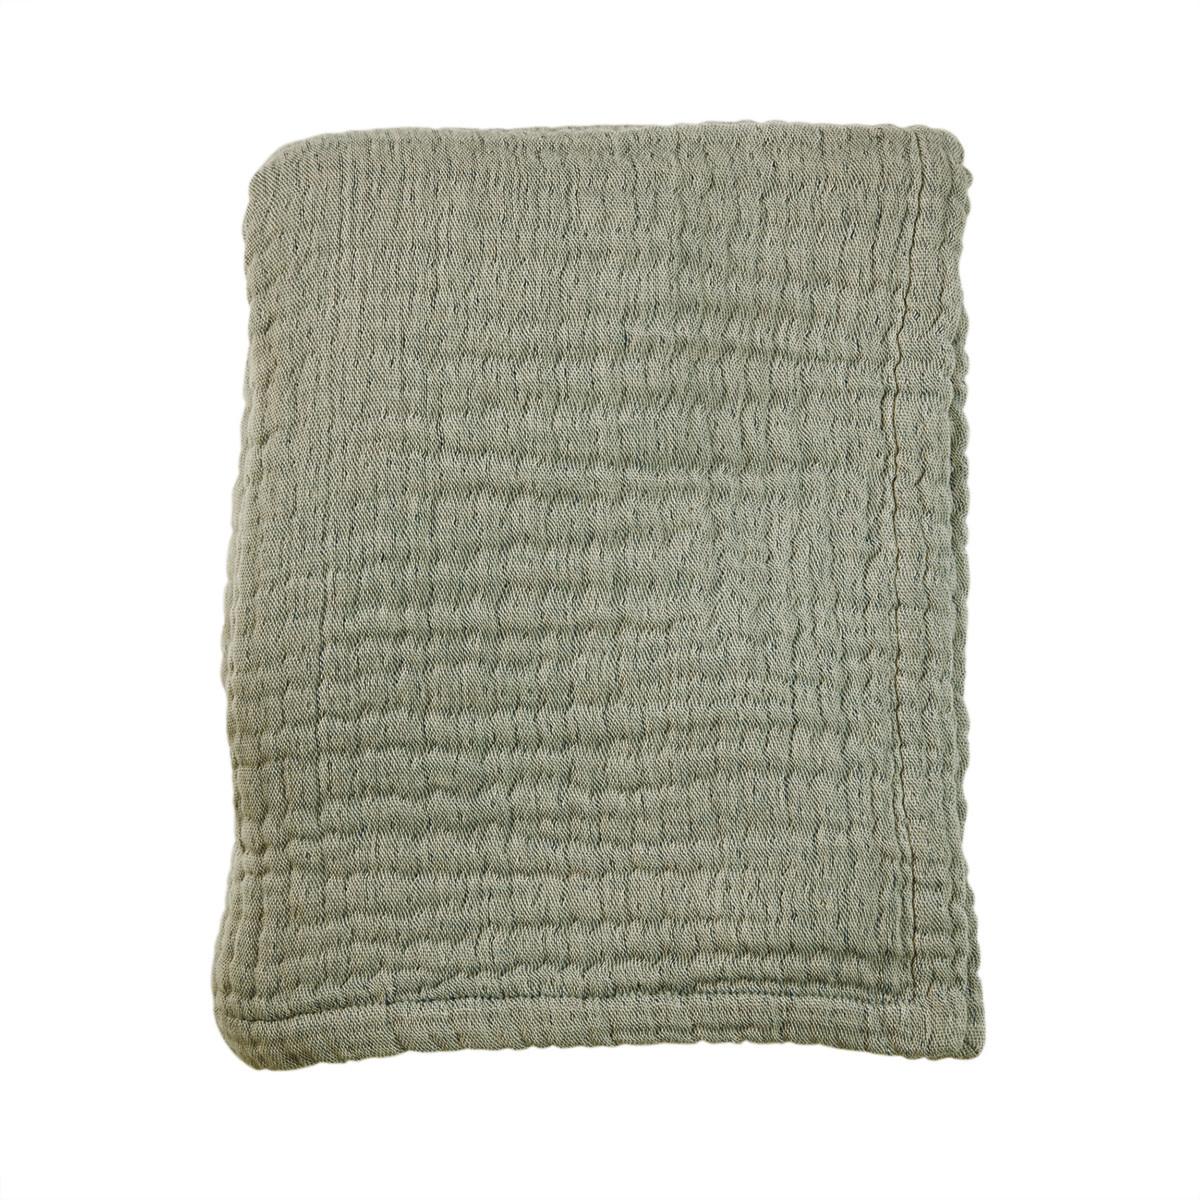 Mies & Co ledikant deken mousseline thyme green-1